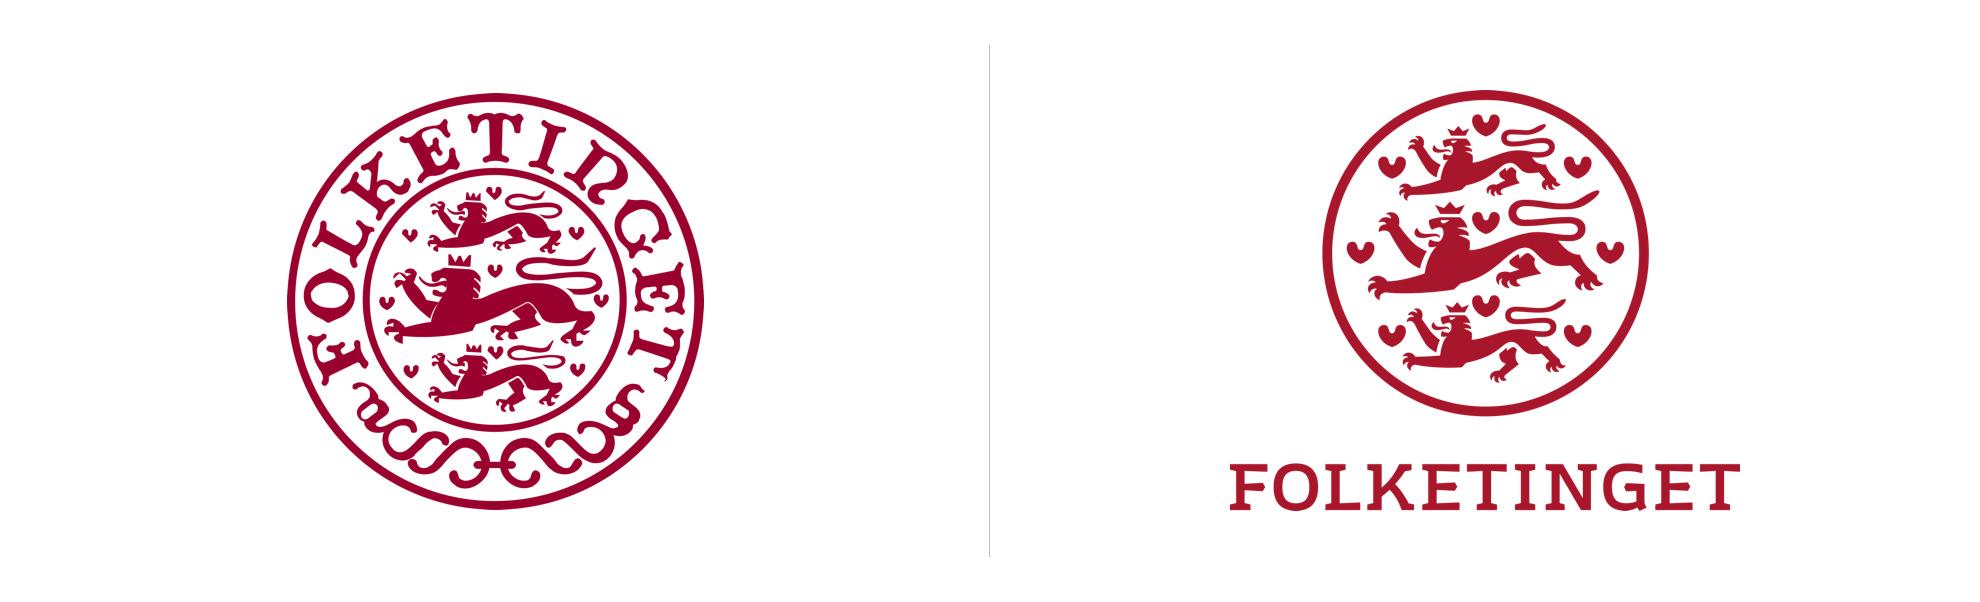 Folketinget nowe istare logo